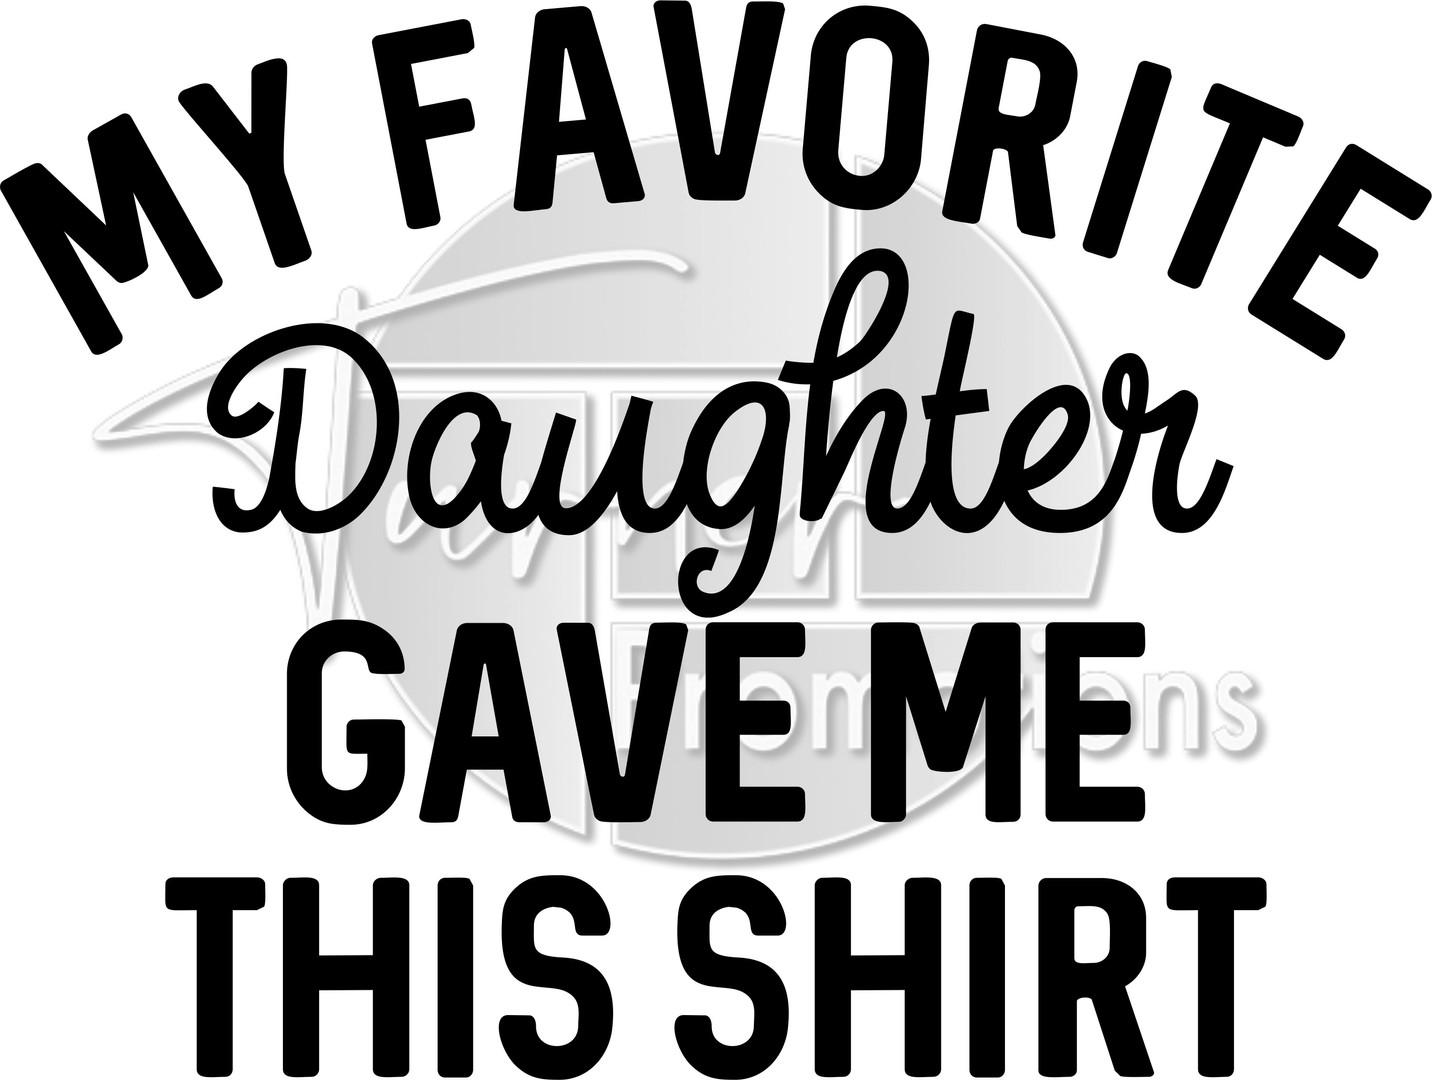 My Favorite Daughter gave shirt.jpg